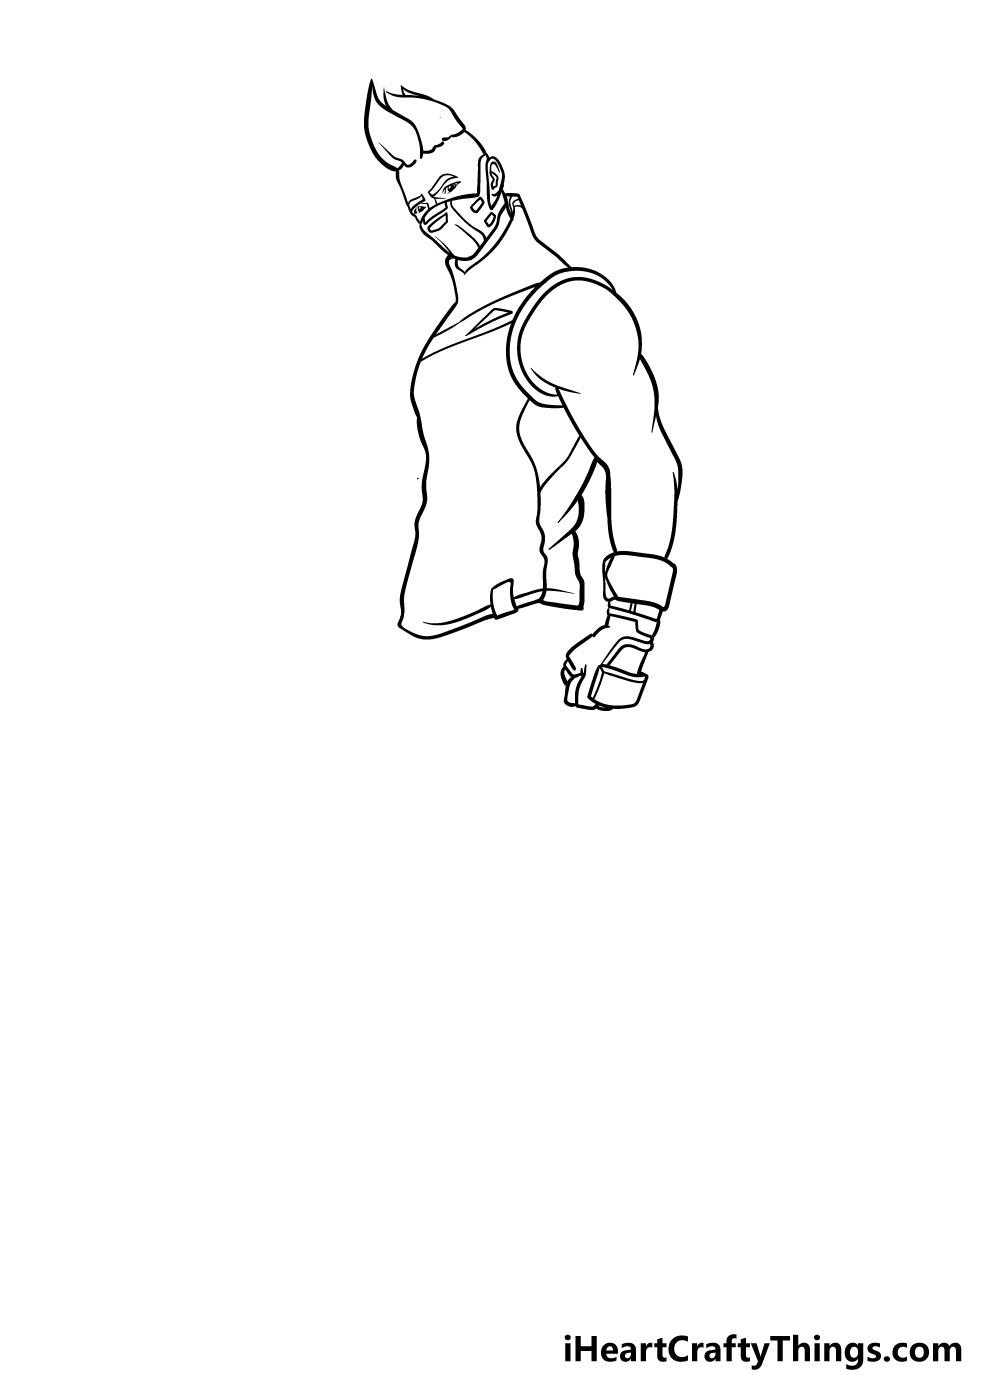 fortnite drawing step 5